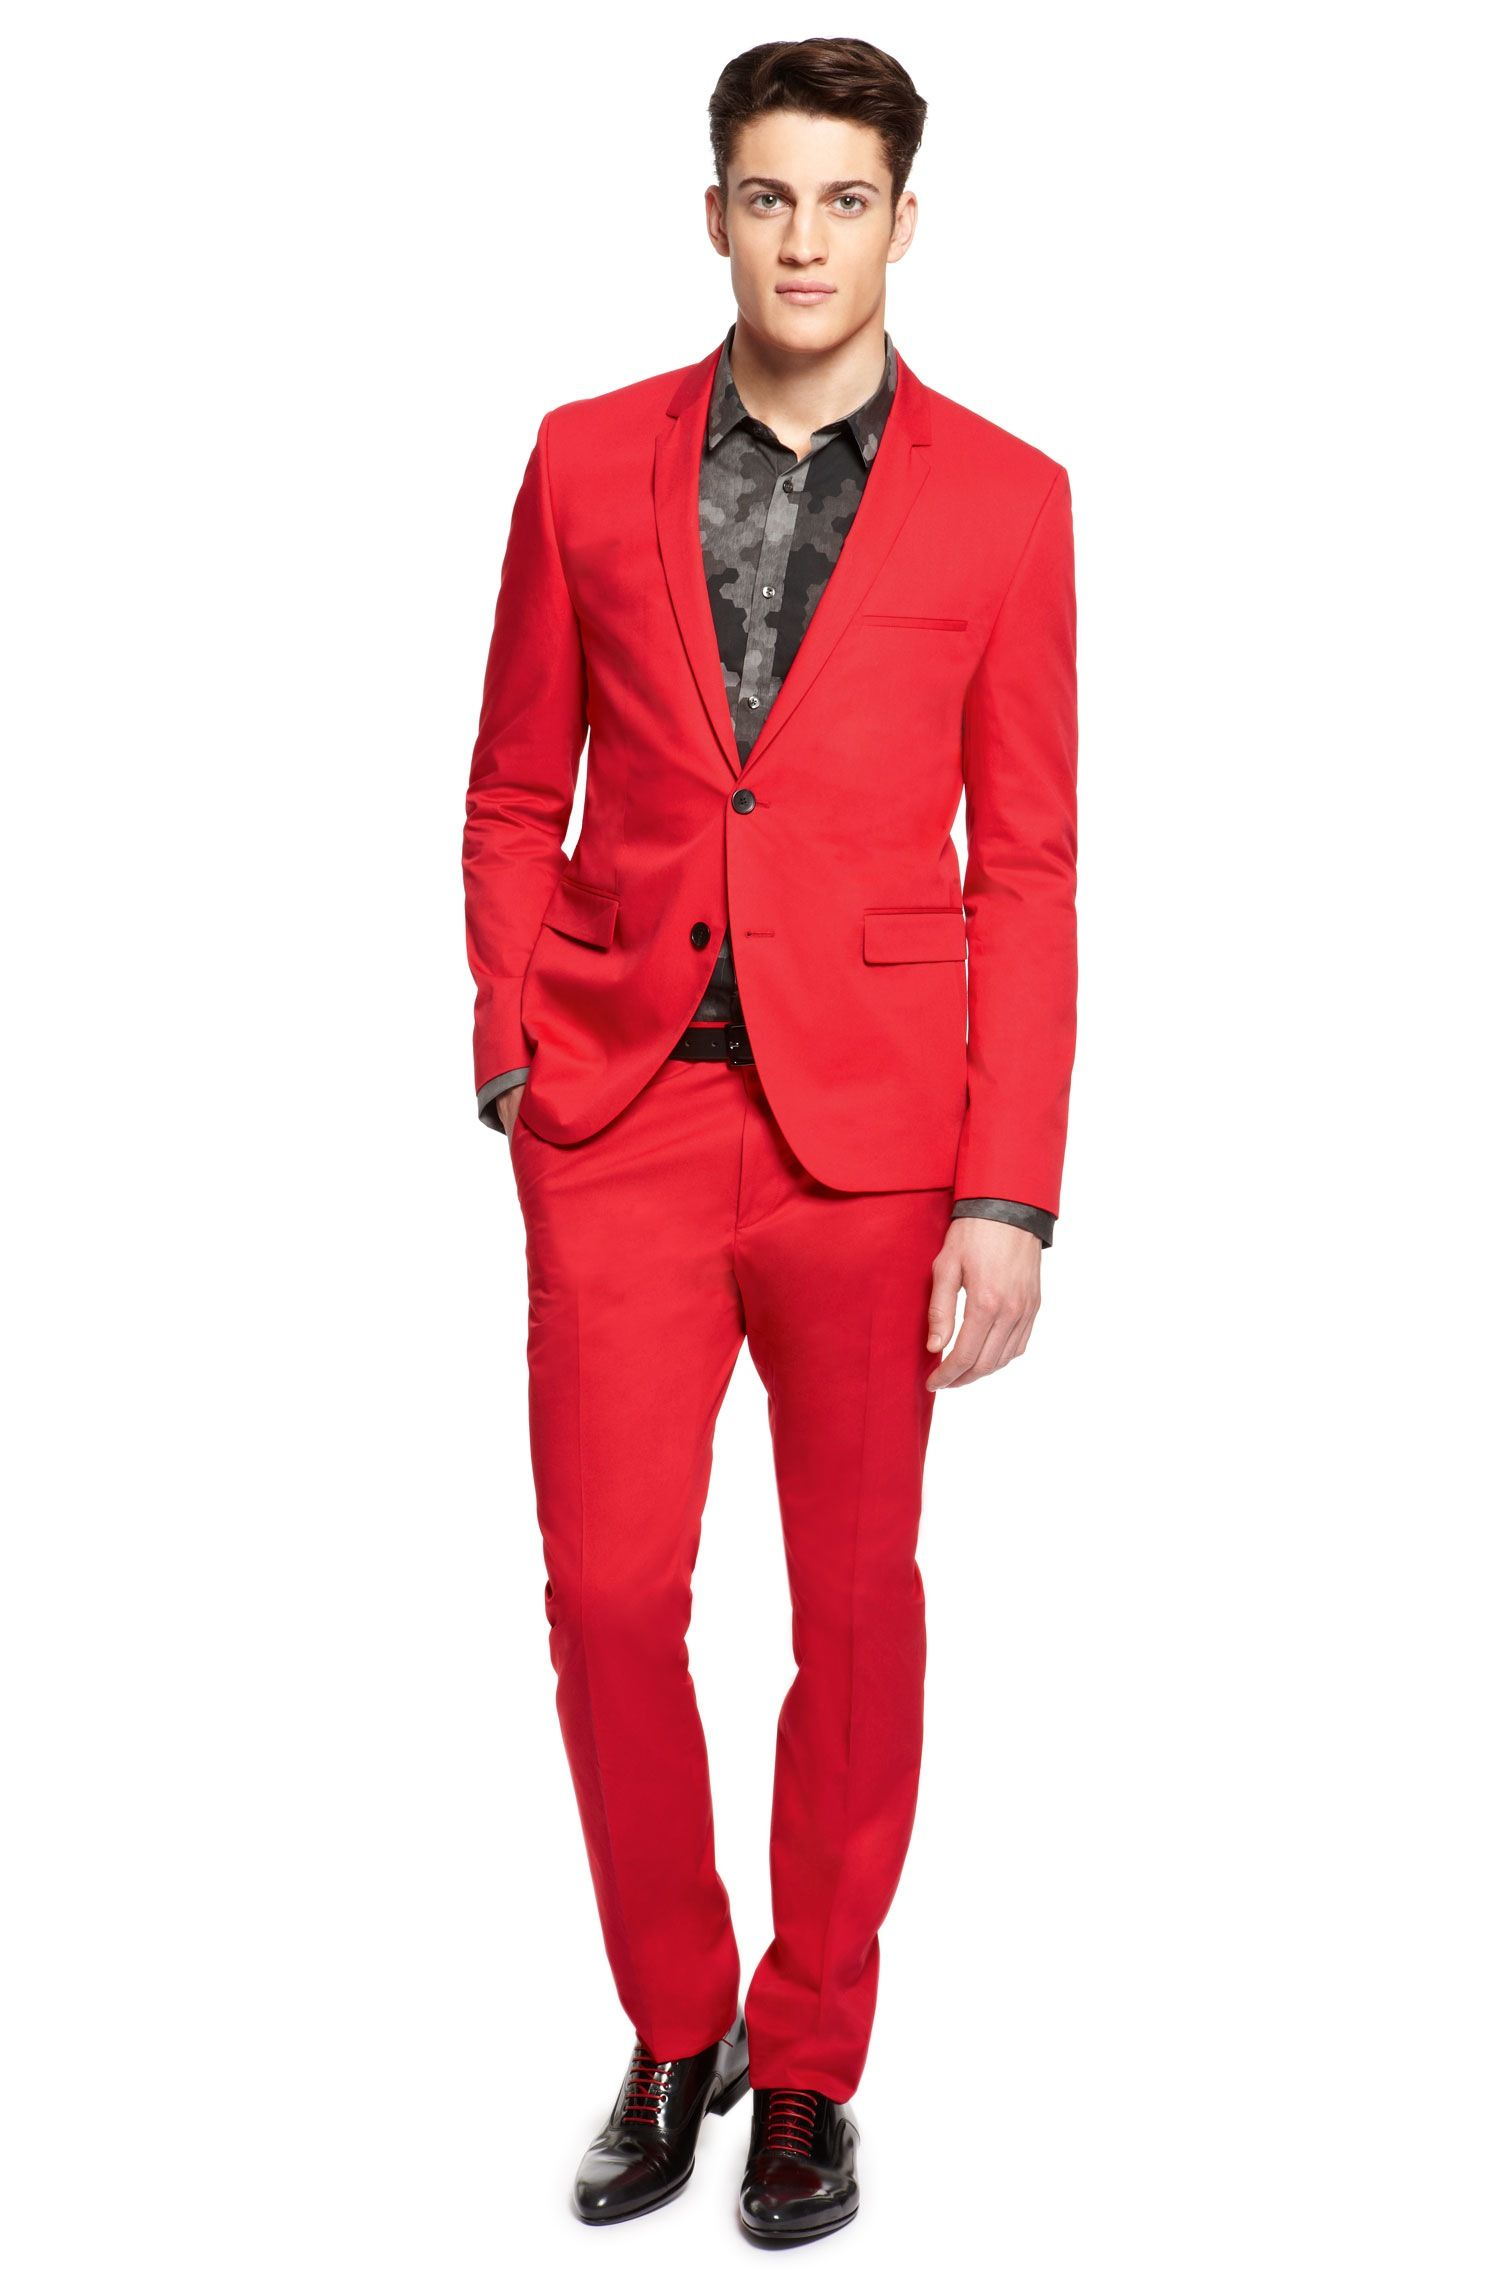 5def1ef2 Adris/Heibo' | Extra Slim Fit, Pima Cotton Suit by HUGO | Mens ...